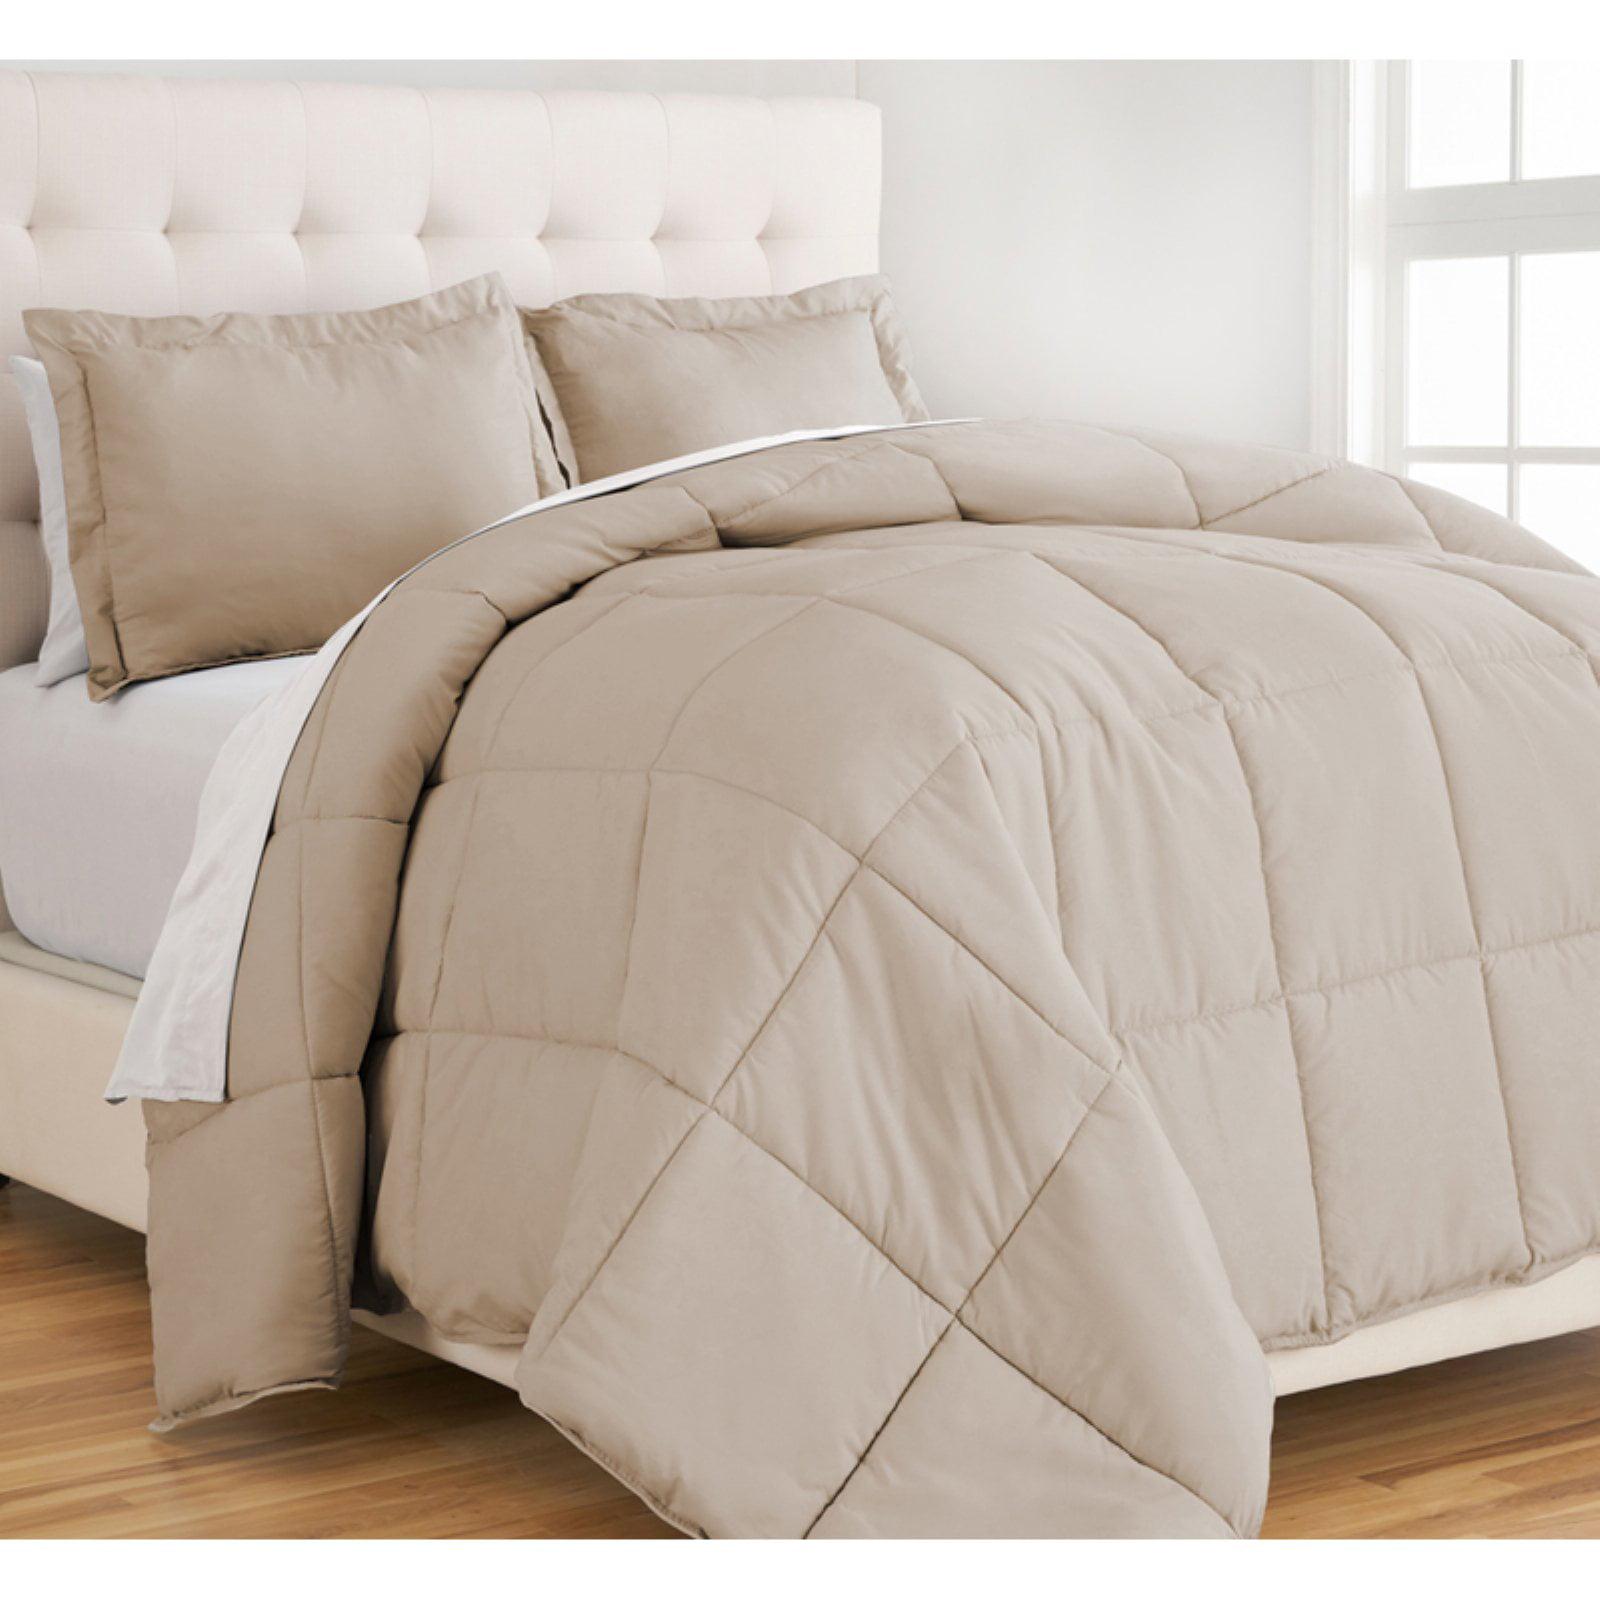 Bare Home Premium Ultra Soft Down Alternative 2 Piece Twin XL Comforter Set